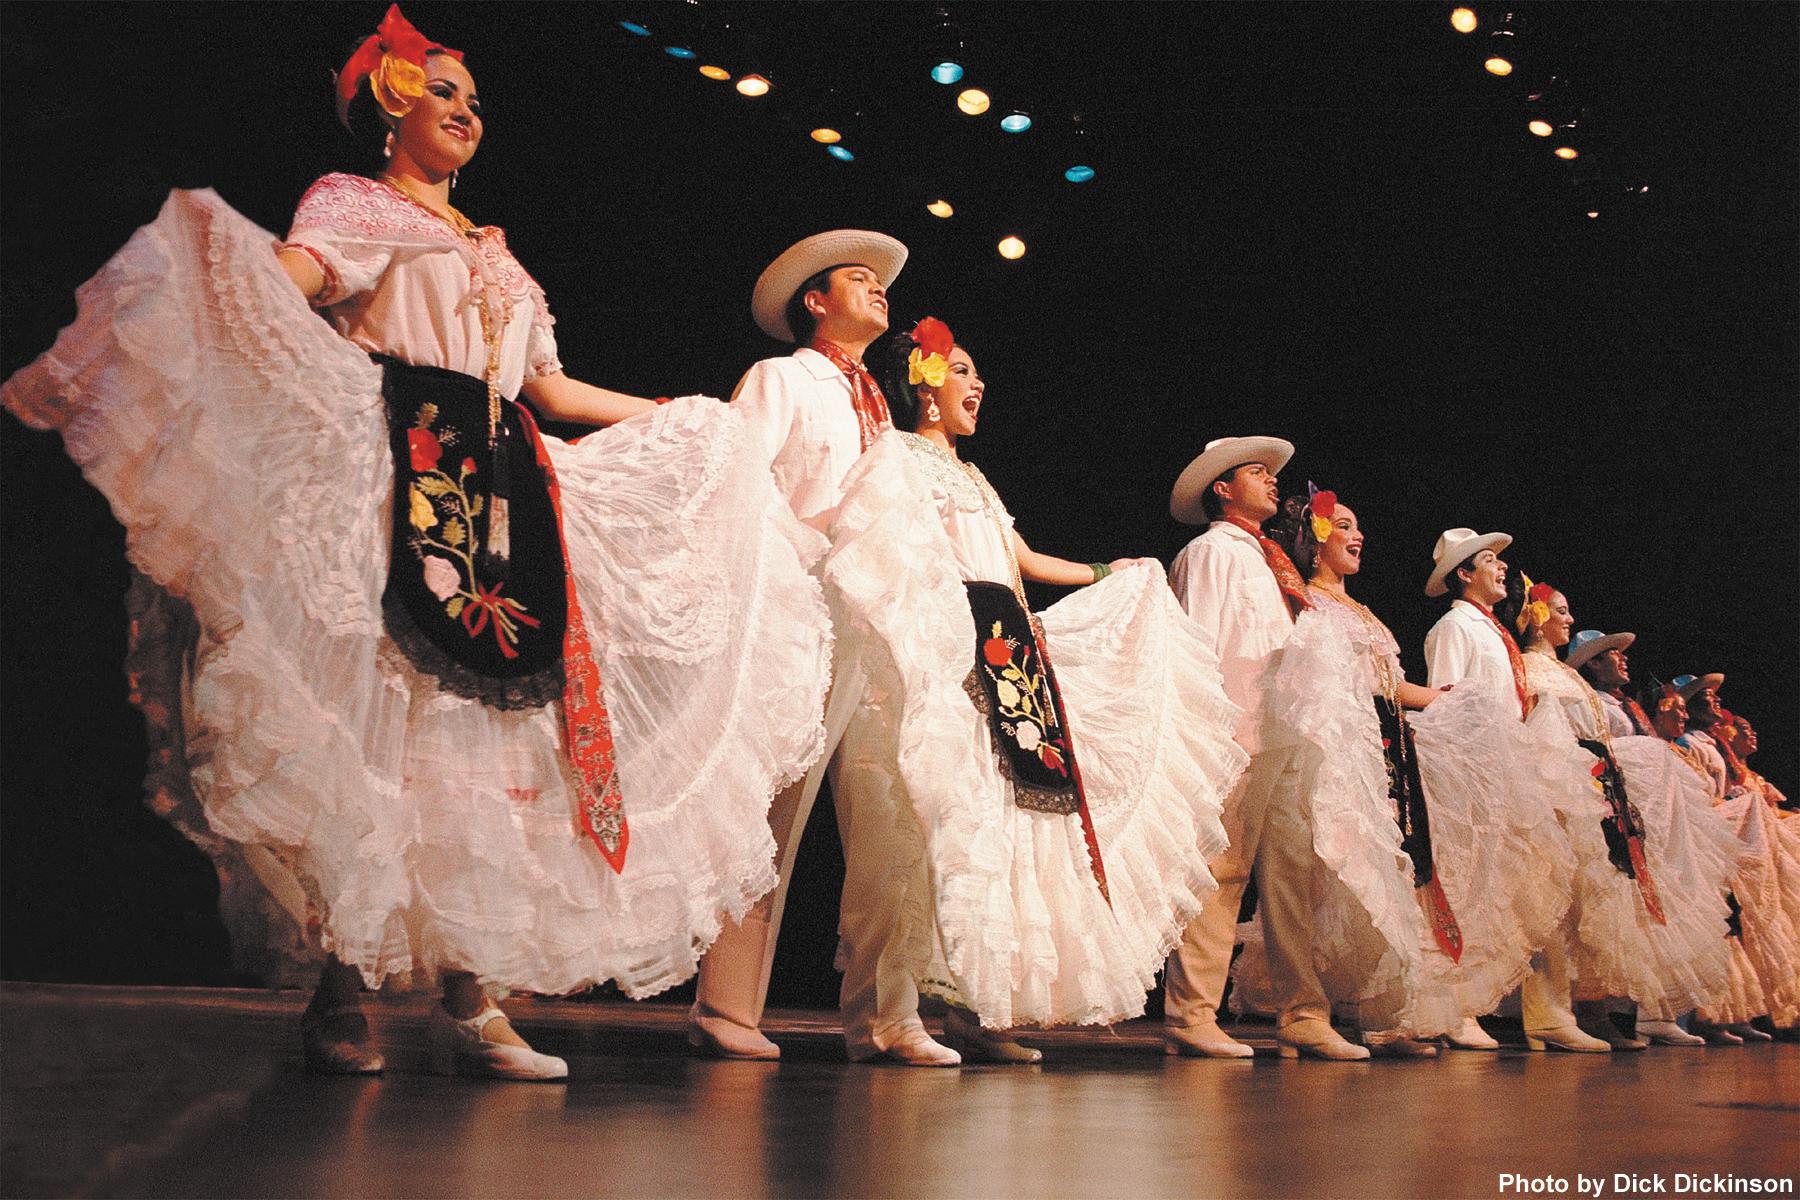 Loco mexican fiesta - 2 1